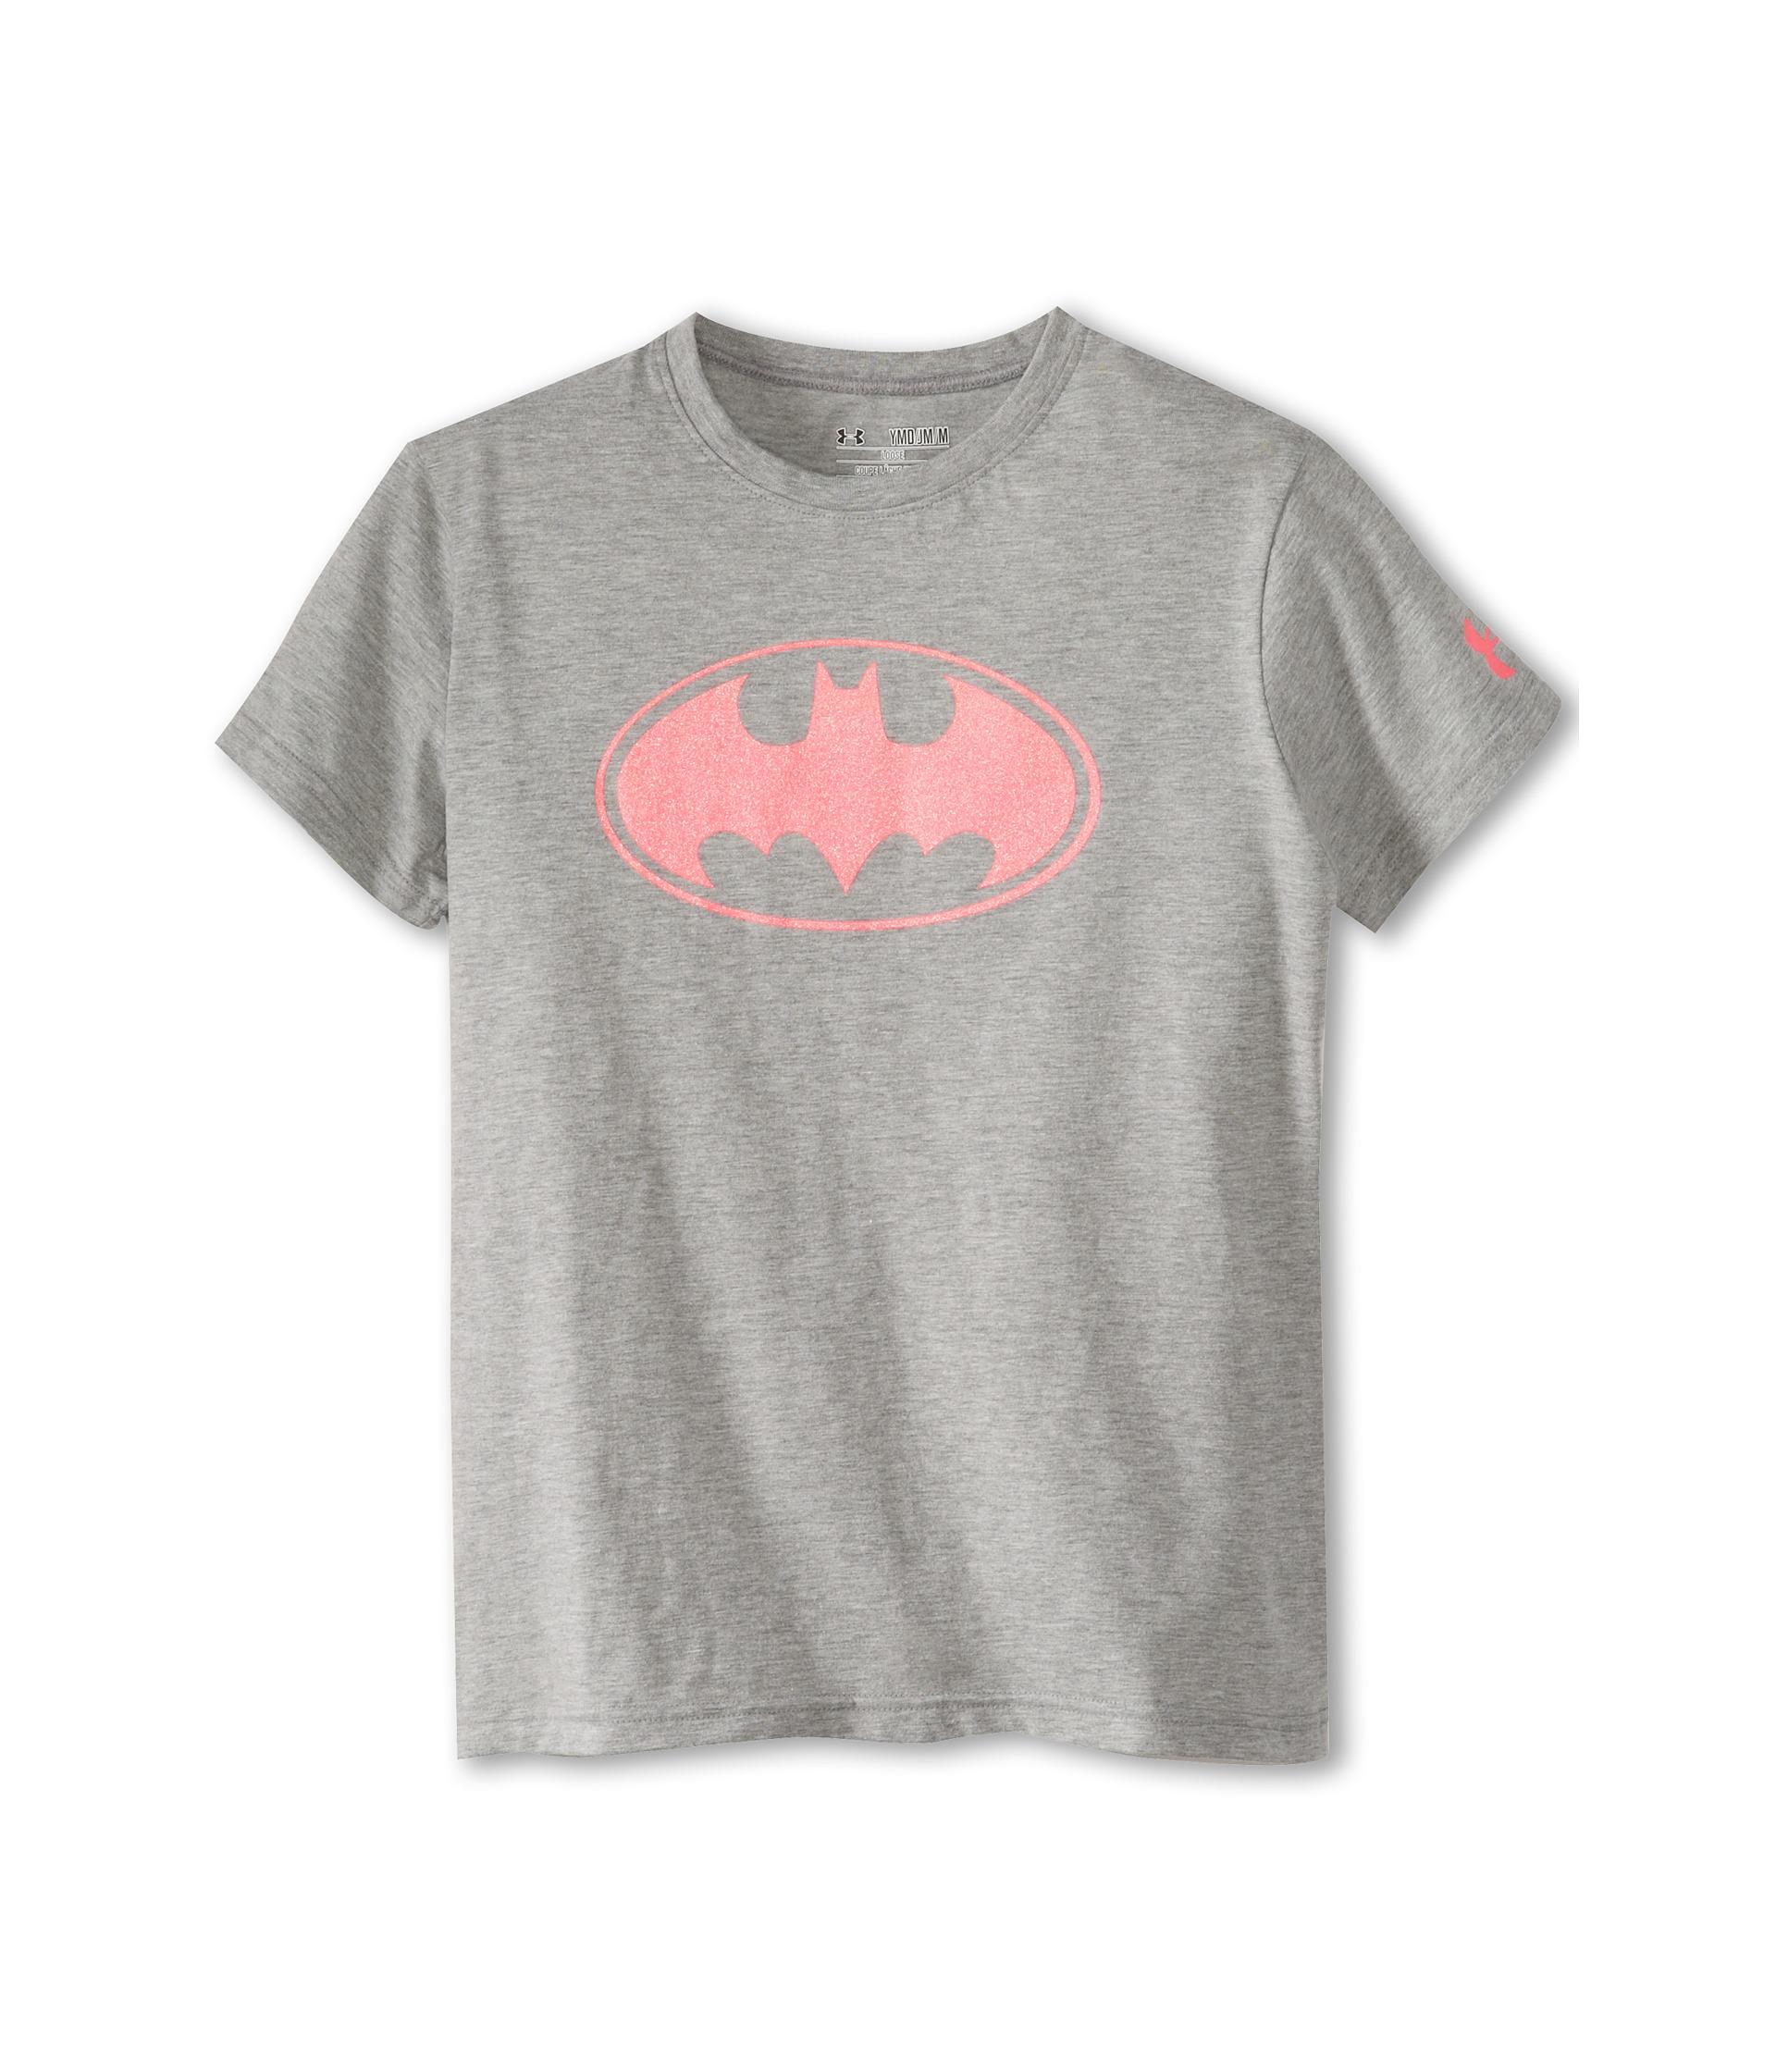 Under armour kids batgirl sparkle t shirt big kids grey for Under armour shirts for kids